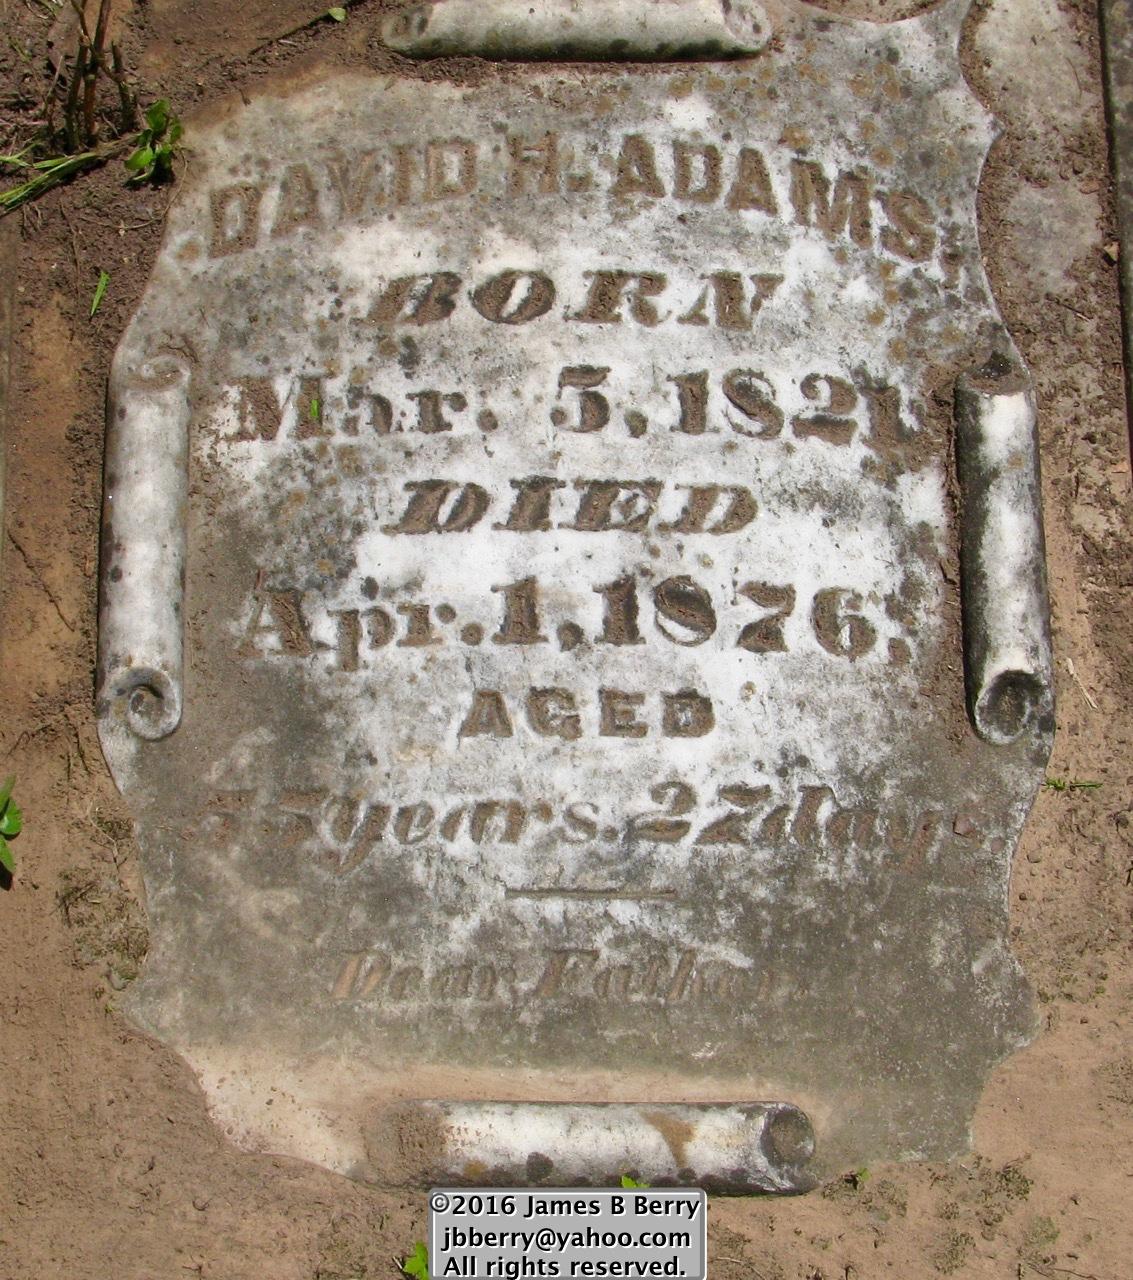 David H. Adams